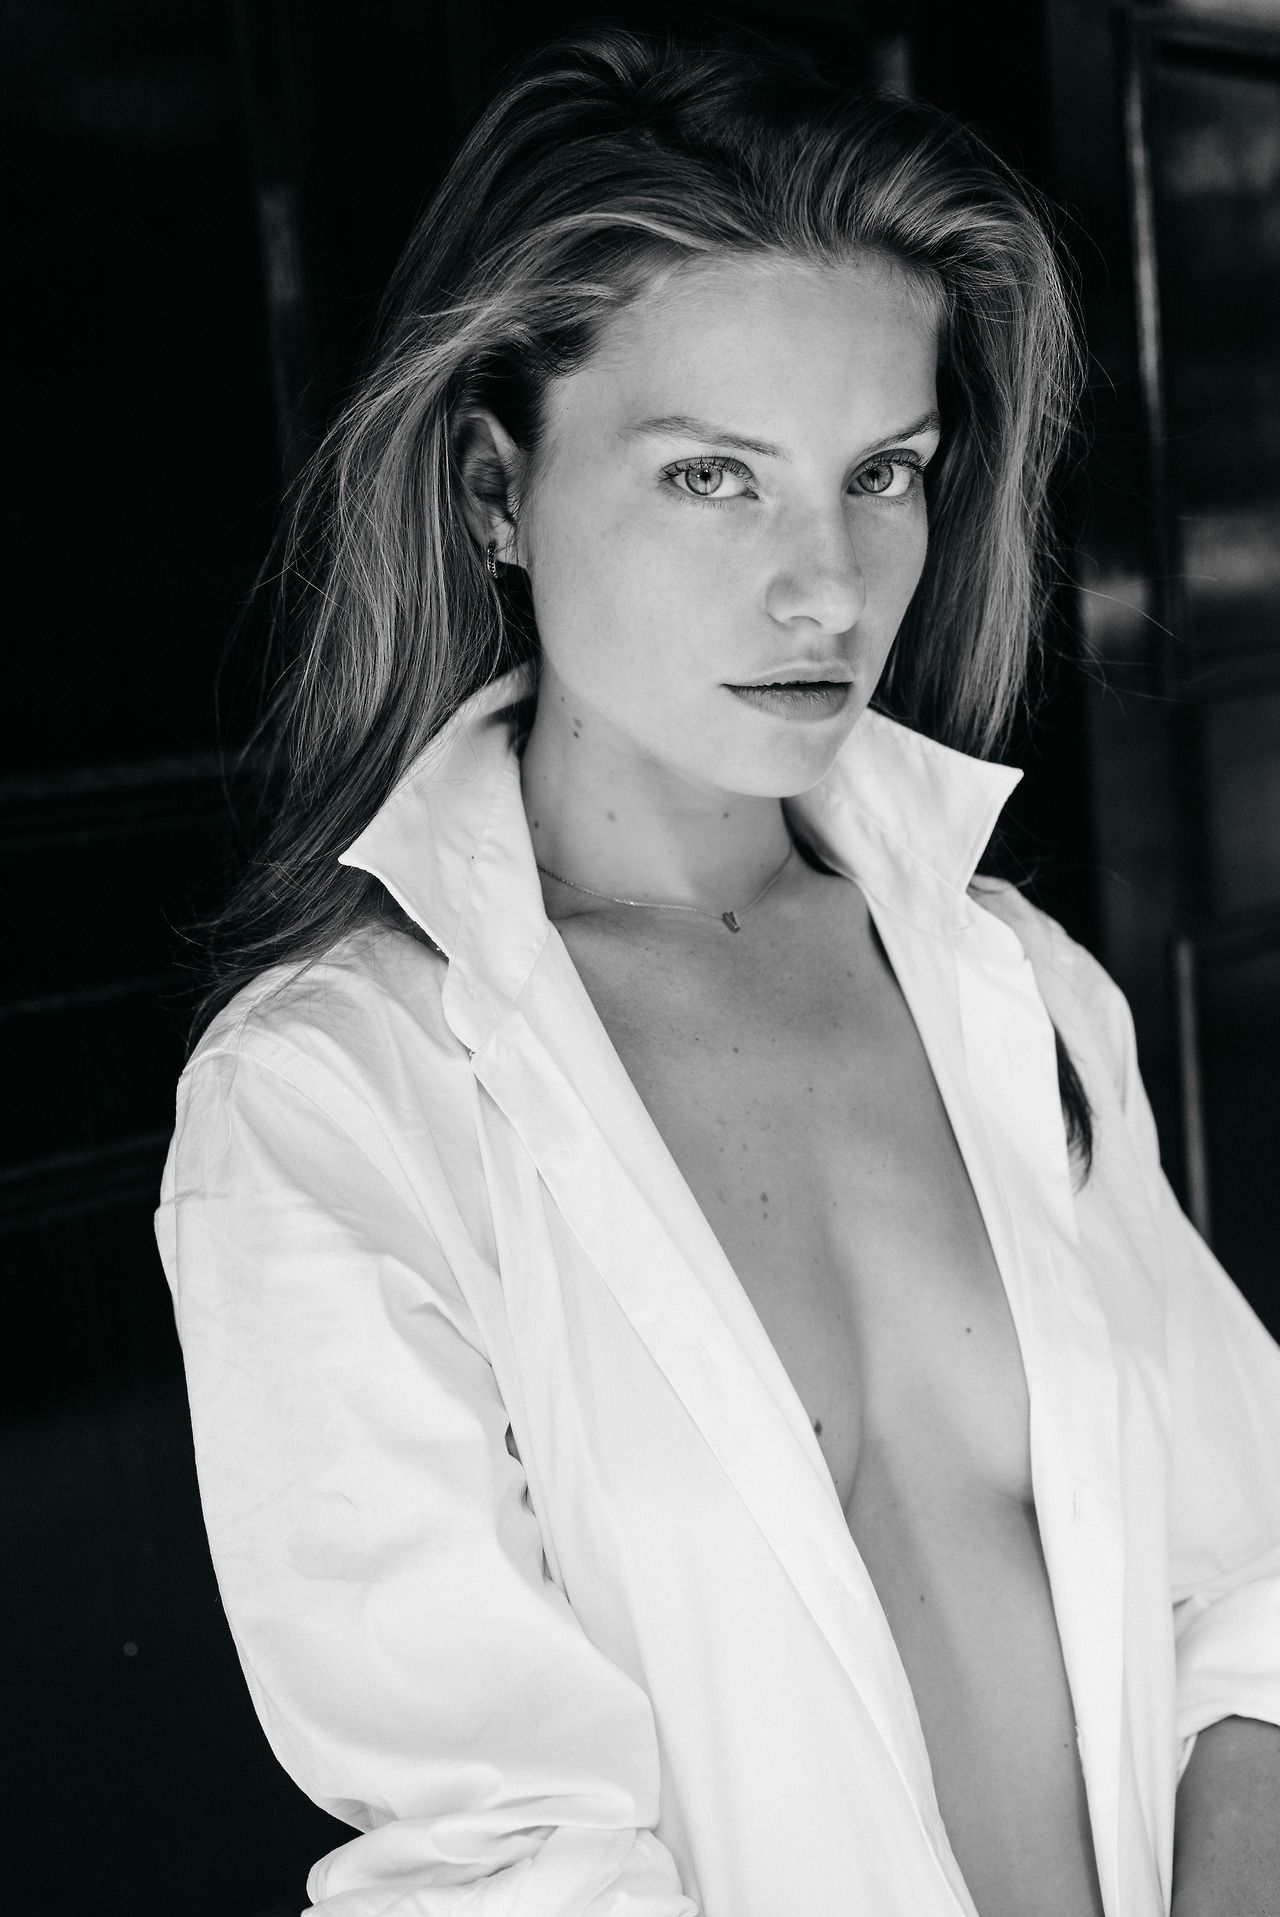 2019 Melanie Griffith nude (54 foto and video), Tits, Bikini, Twitter, cameltoe 2019